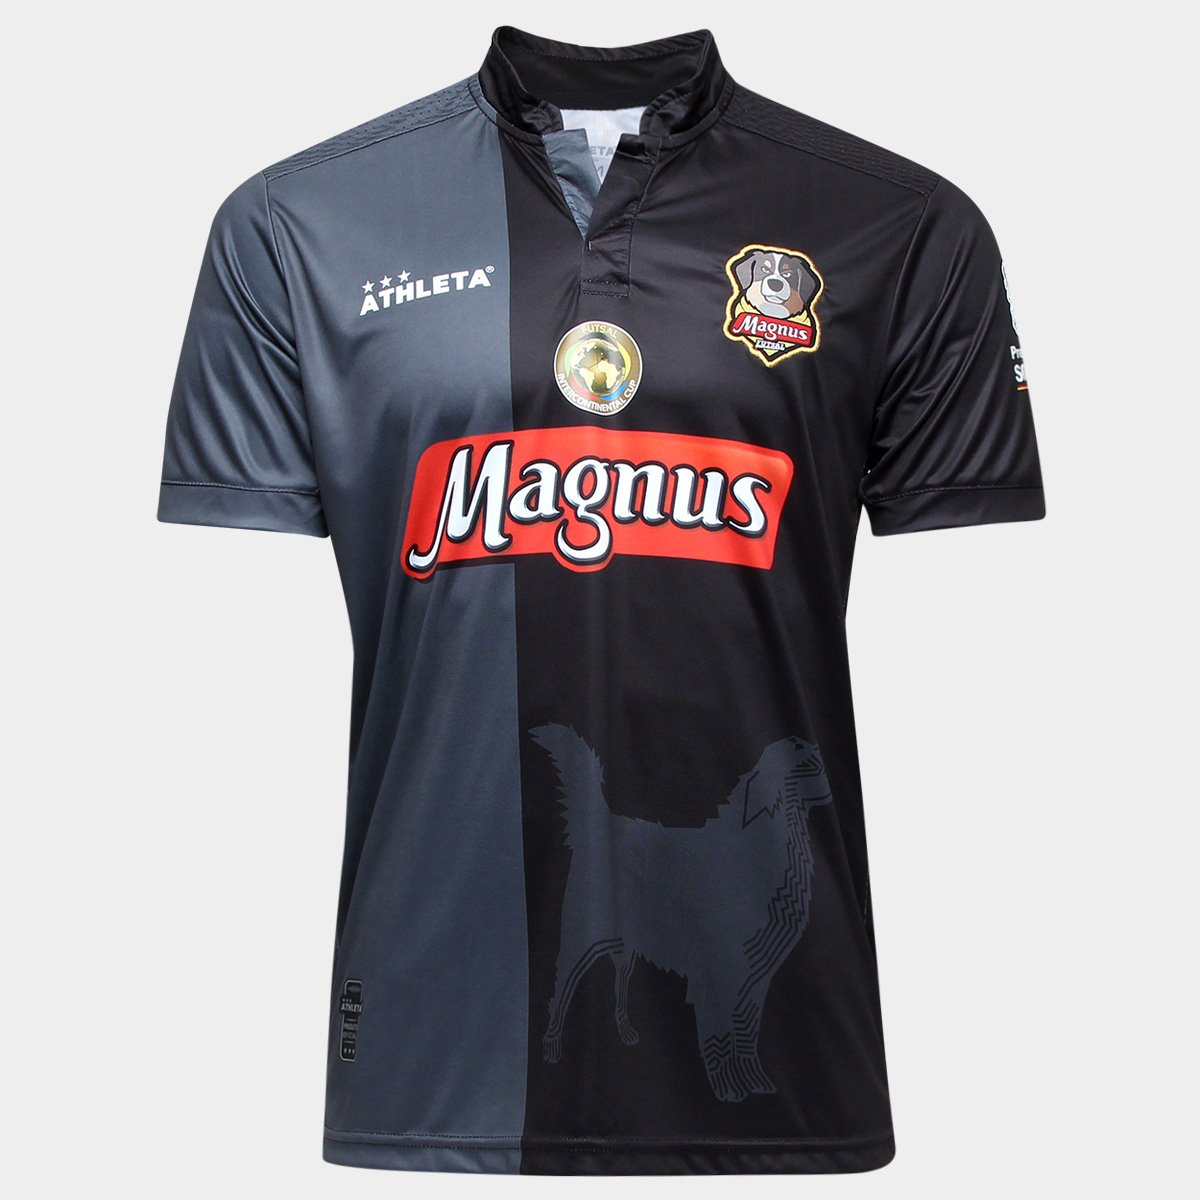 Camisa Magnus Futsal II s nº 17 18 - Torcedor Super Bolla Masculina -  Compre Agora  6232081e9e359